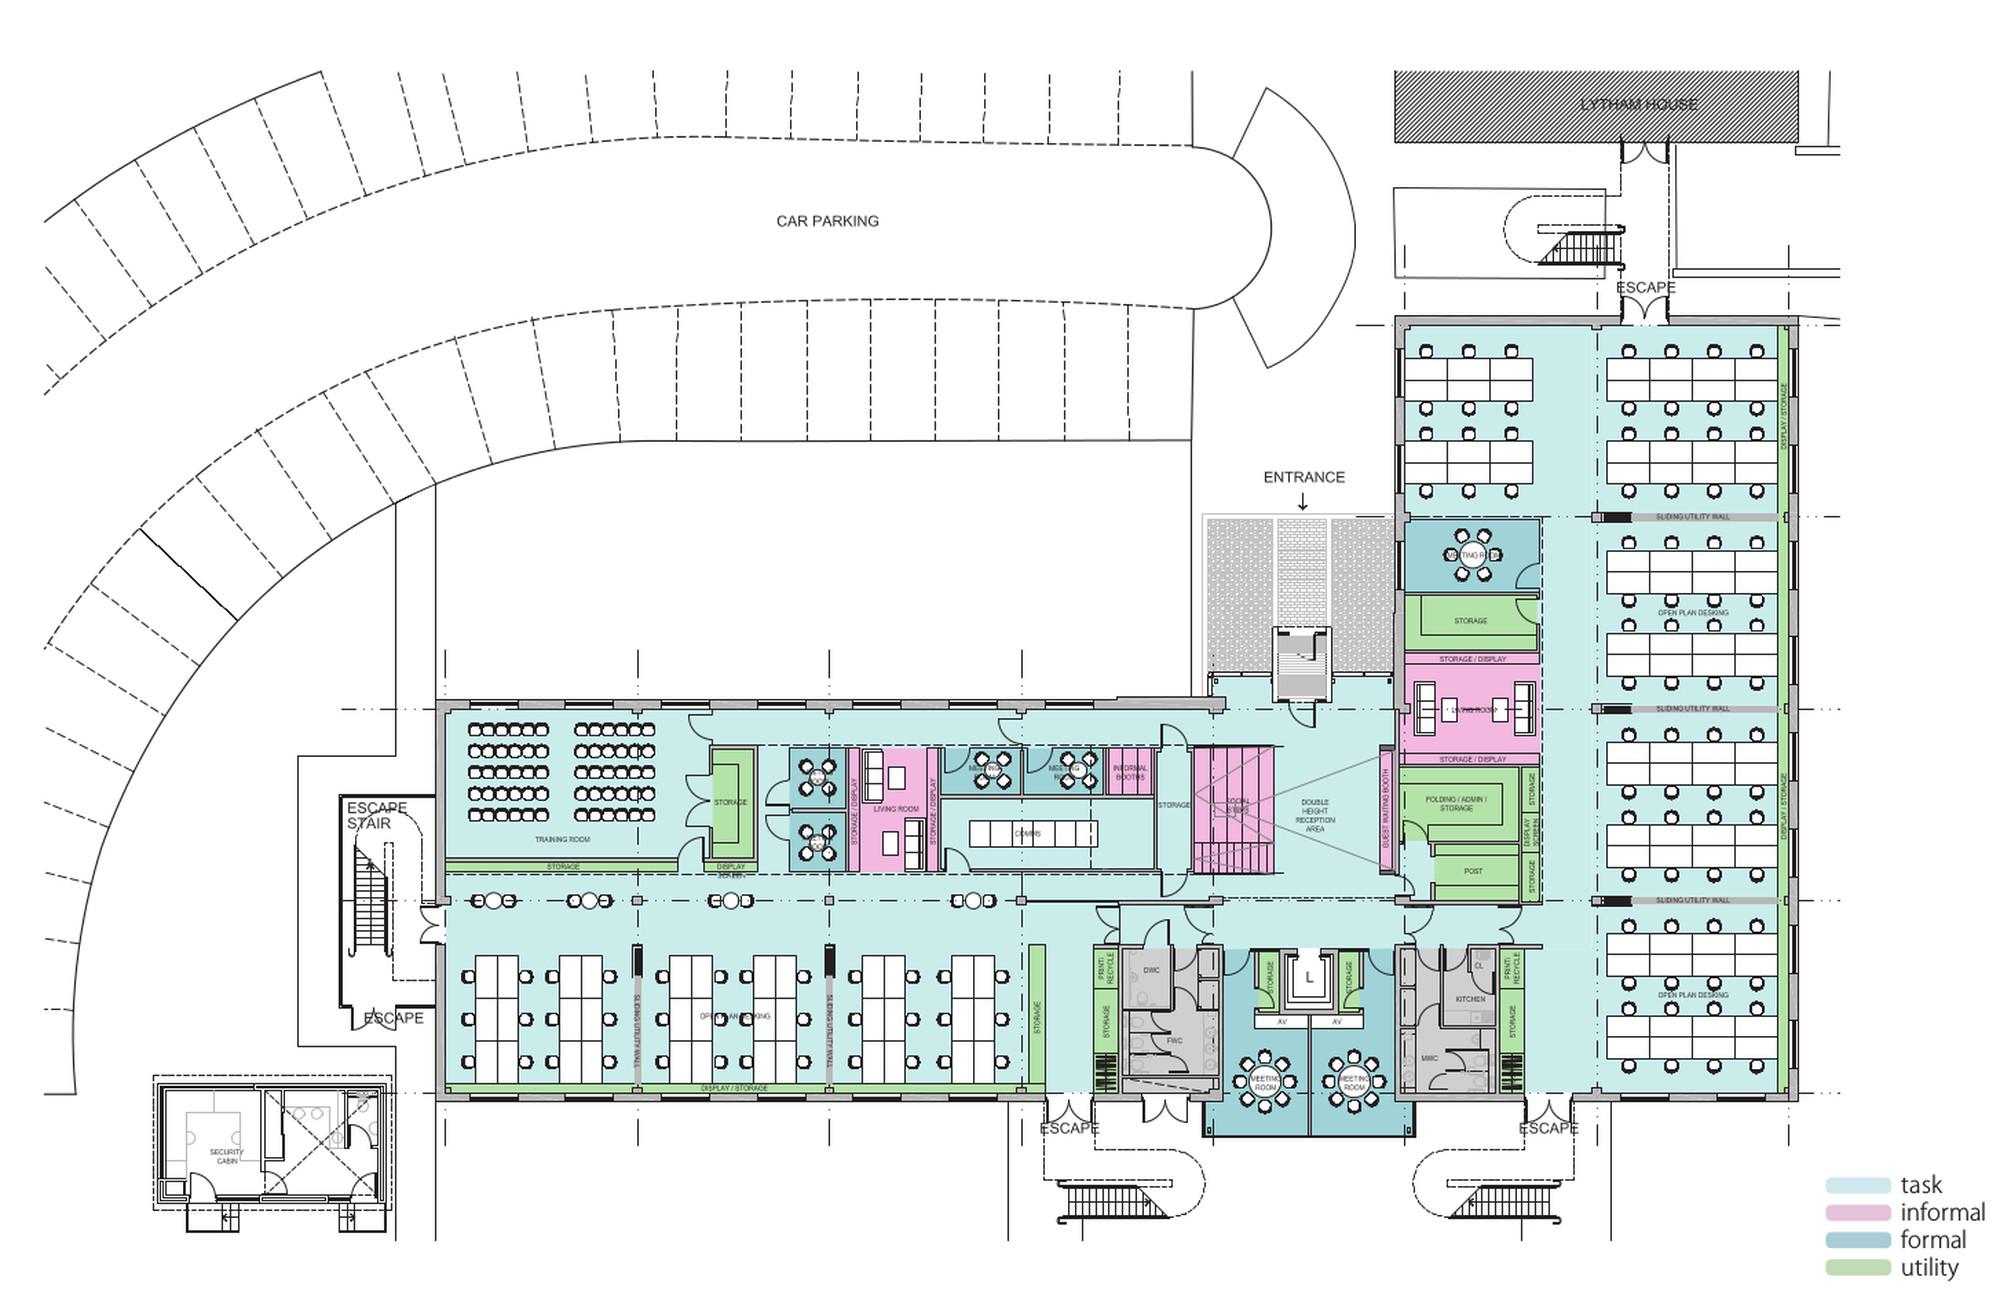 Rightmove Offices Ground Floor Plan